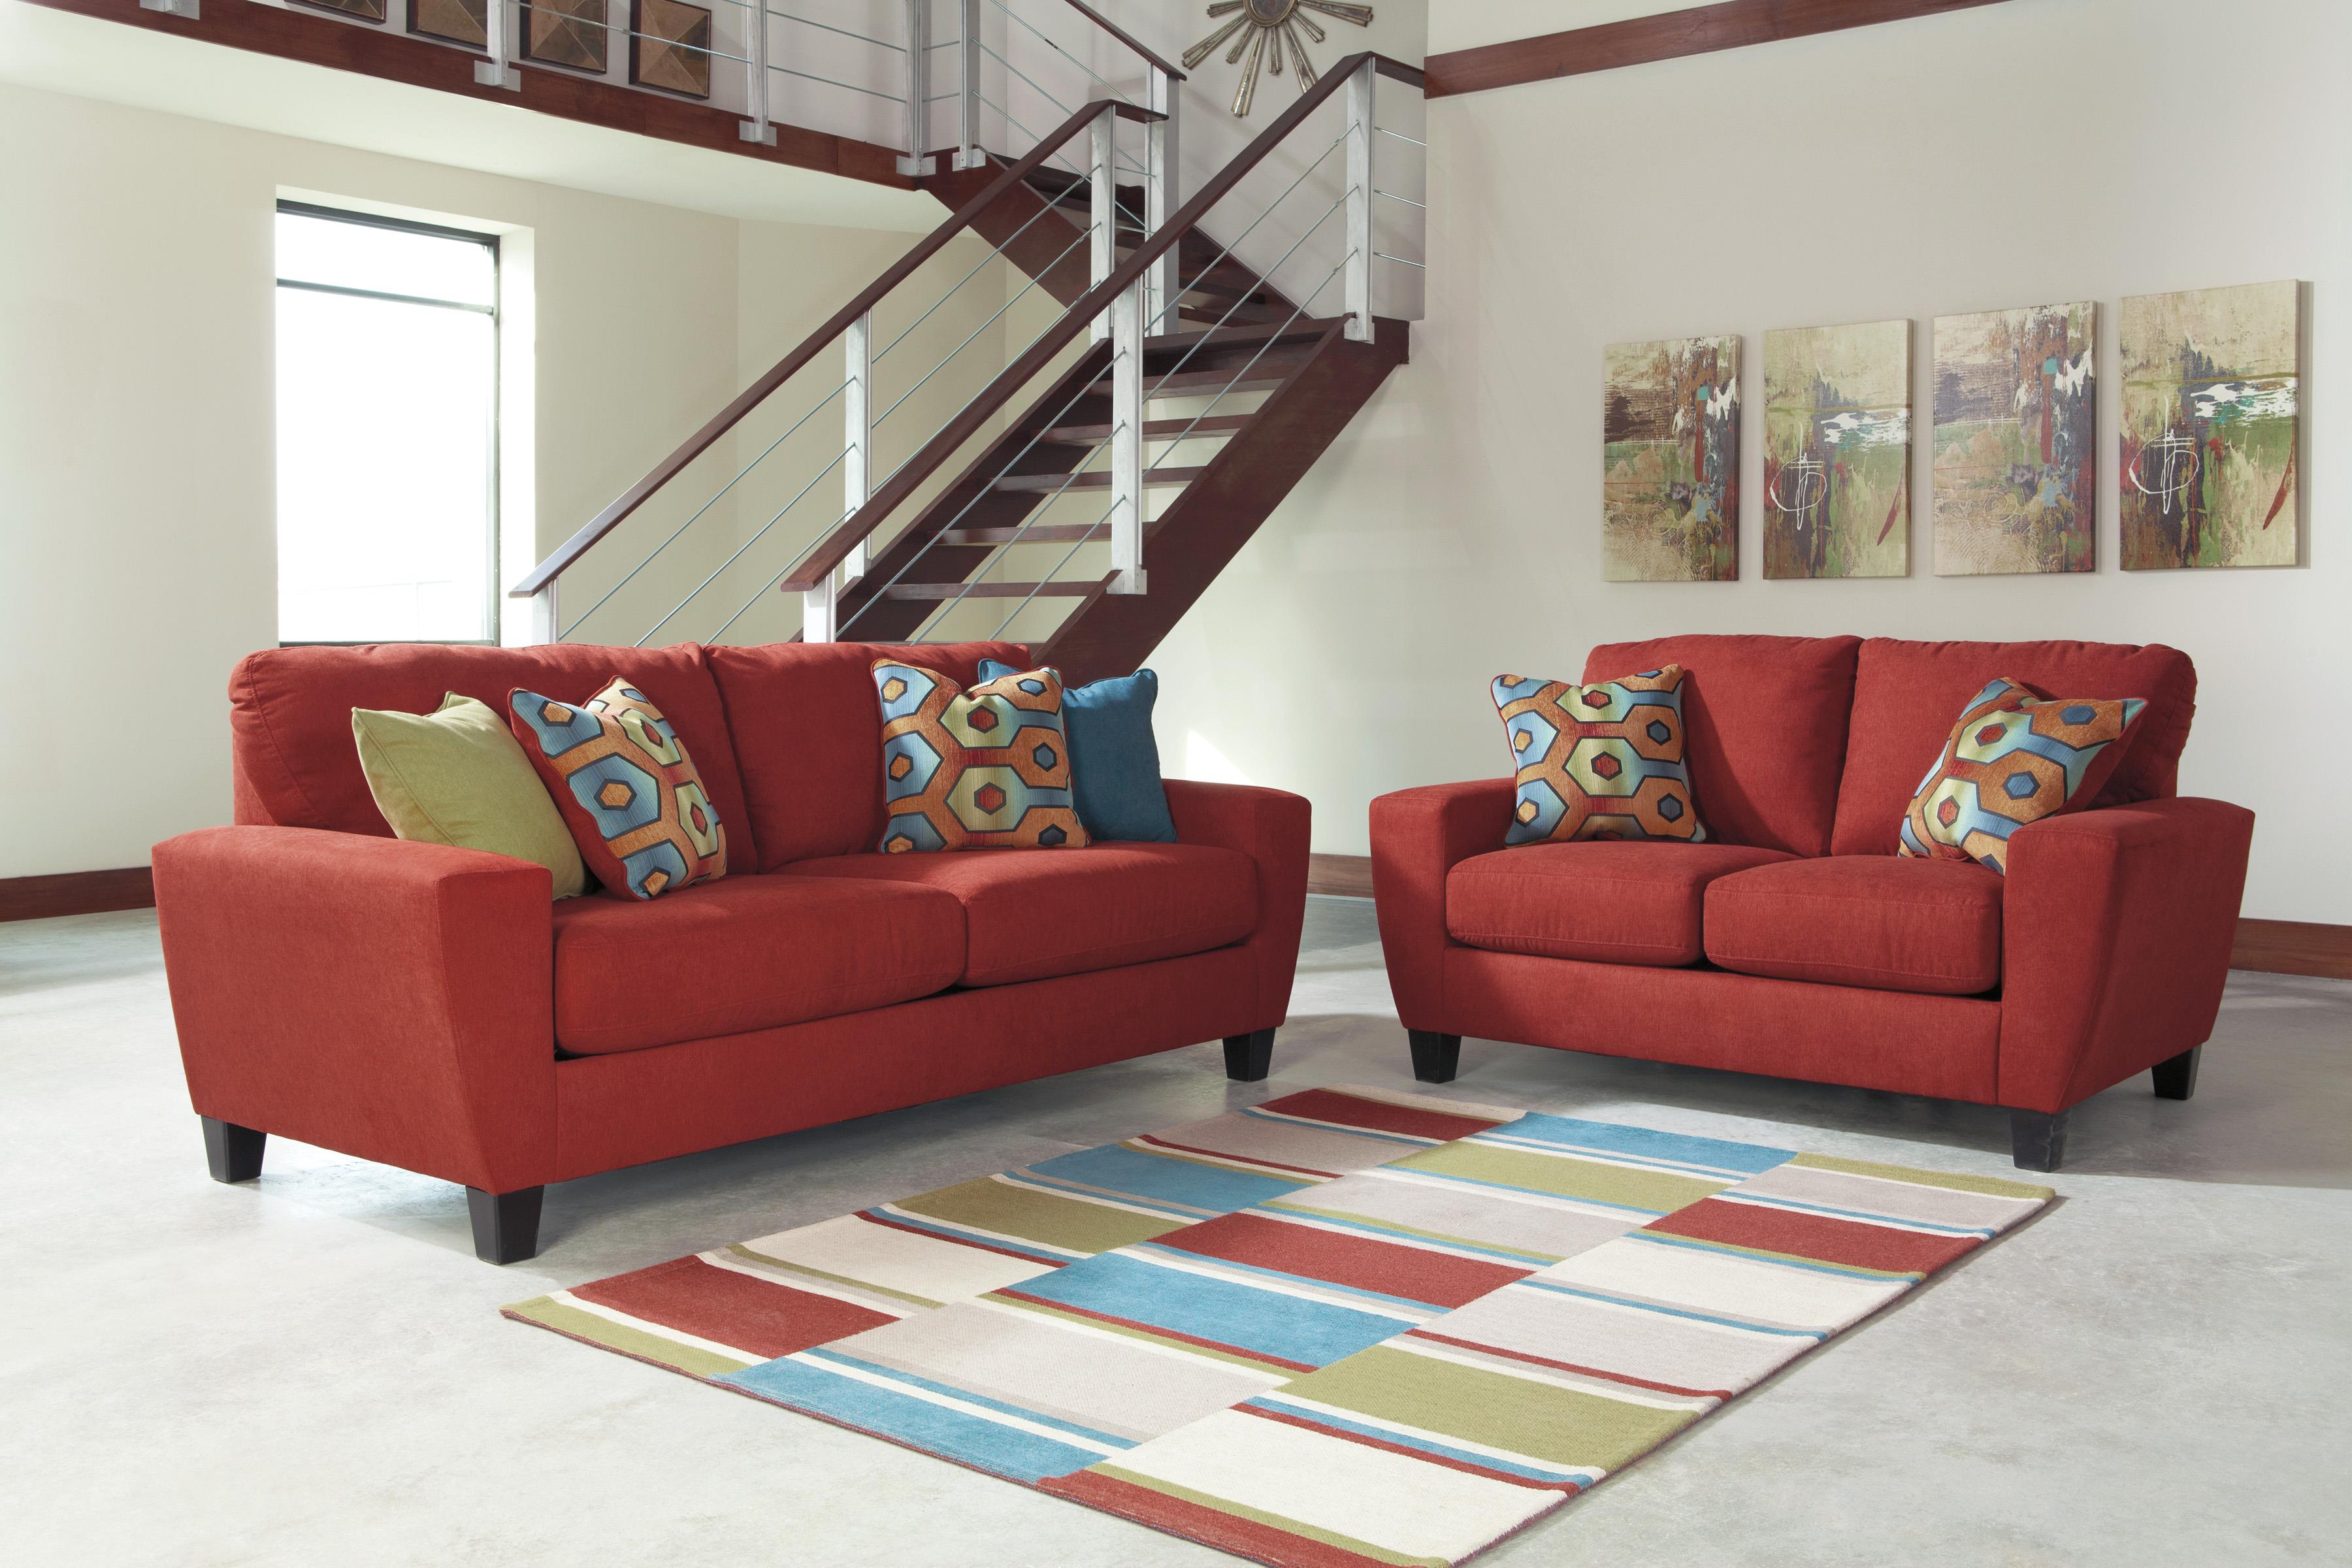 Signature Design by Ashley Sagen Stationary Living Room Group - Item Number: 93903 Living Room Group 1